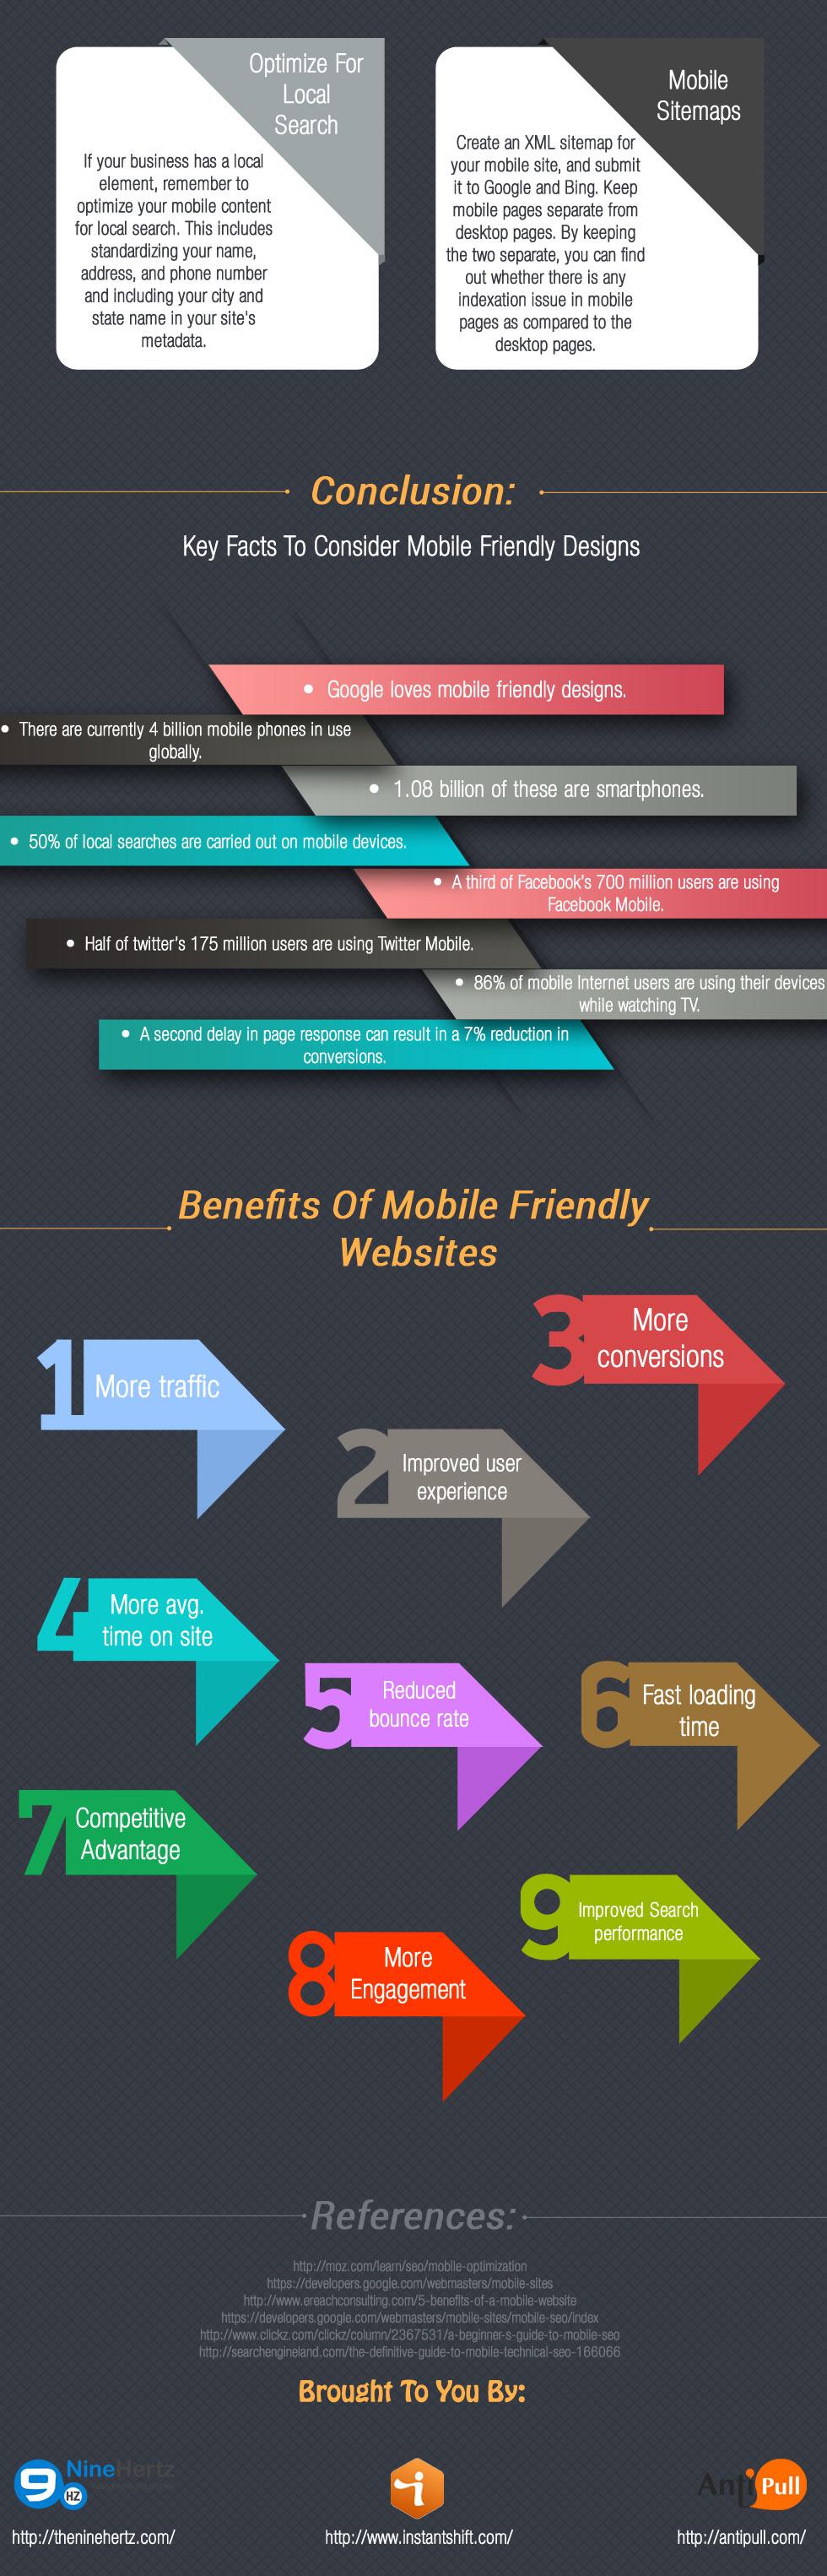 instantShift - Detailed Guide on Mobile SEO